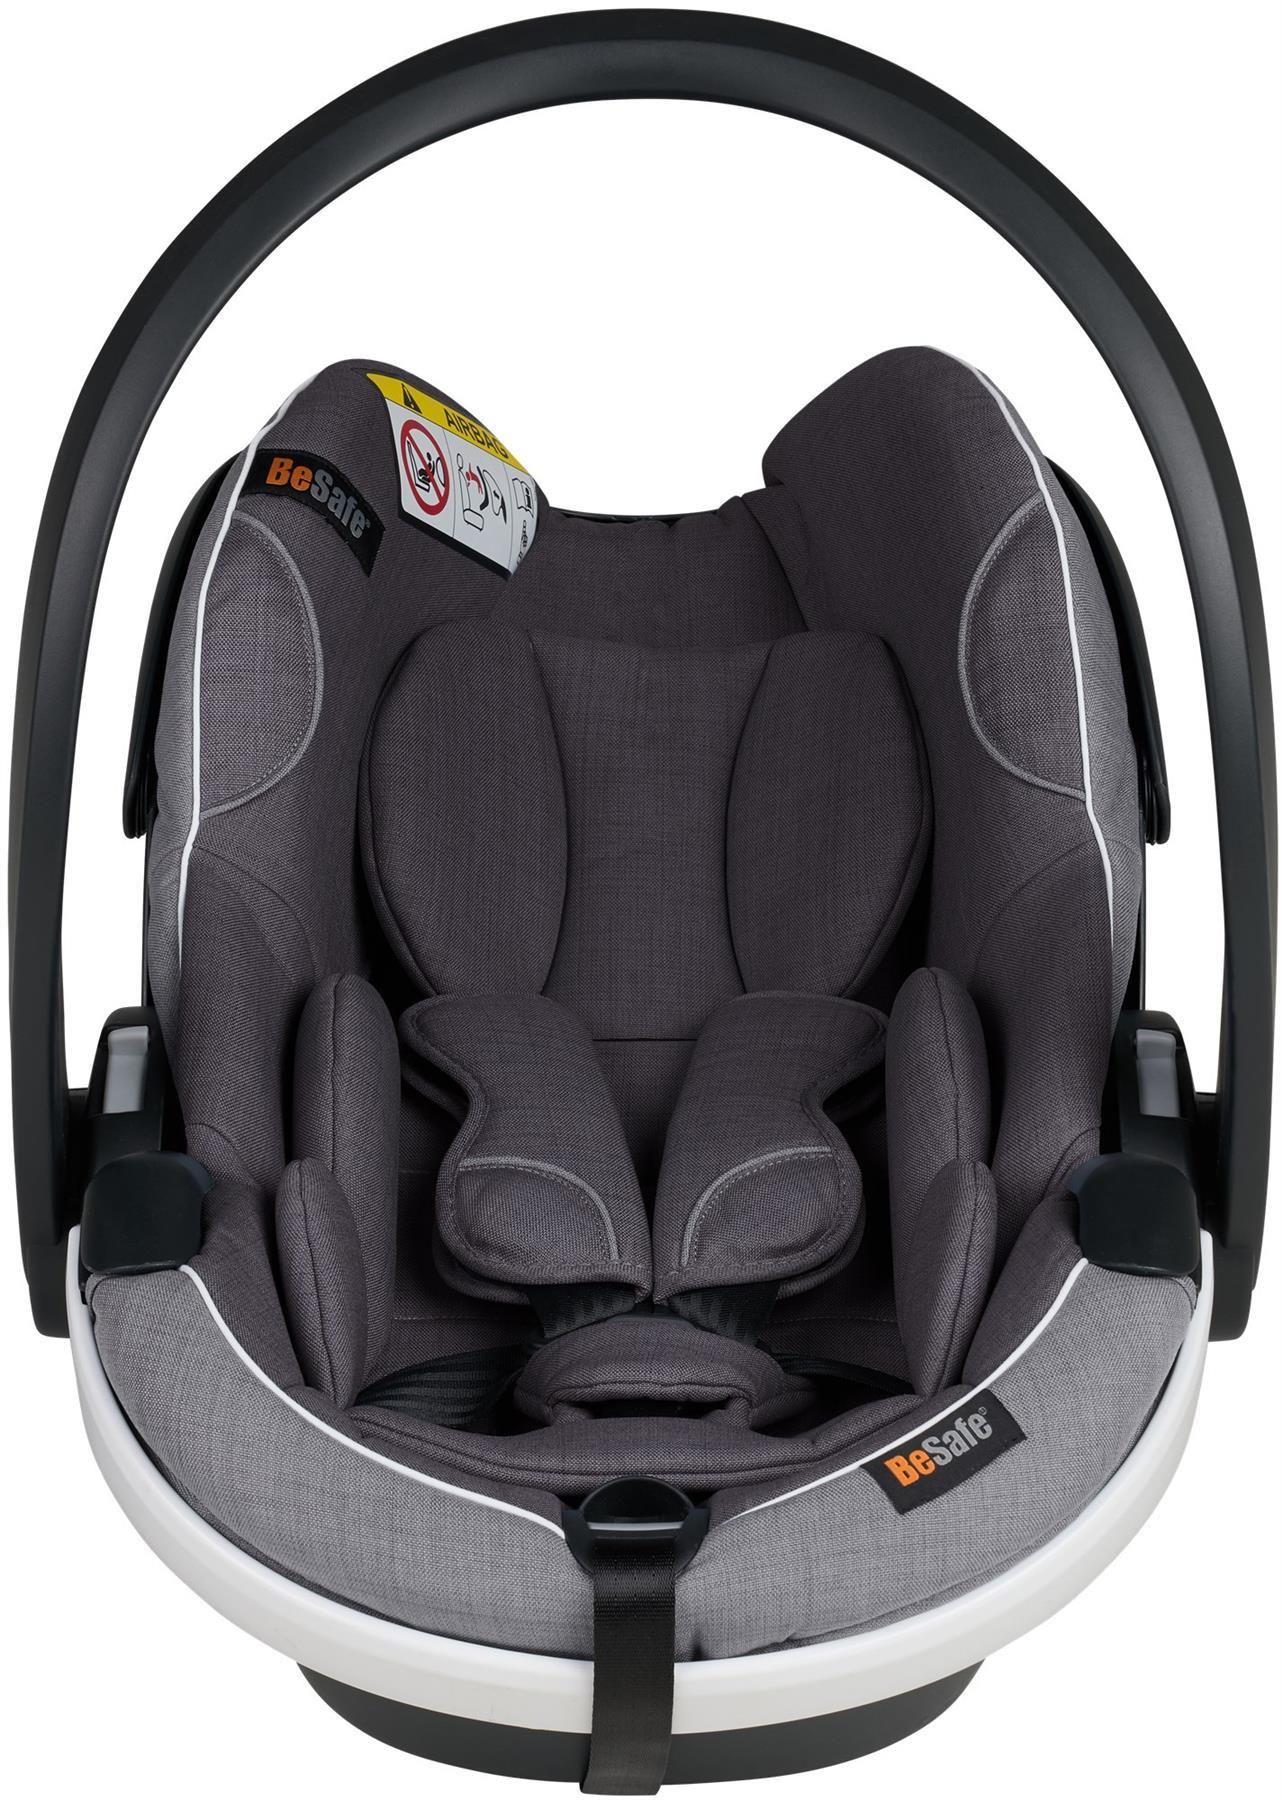 Besafe Izi Go Modular X1 I Size Metallic Melange In 2020 Pushchair Travel System Baby Seat Baby Thermometer